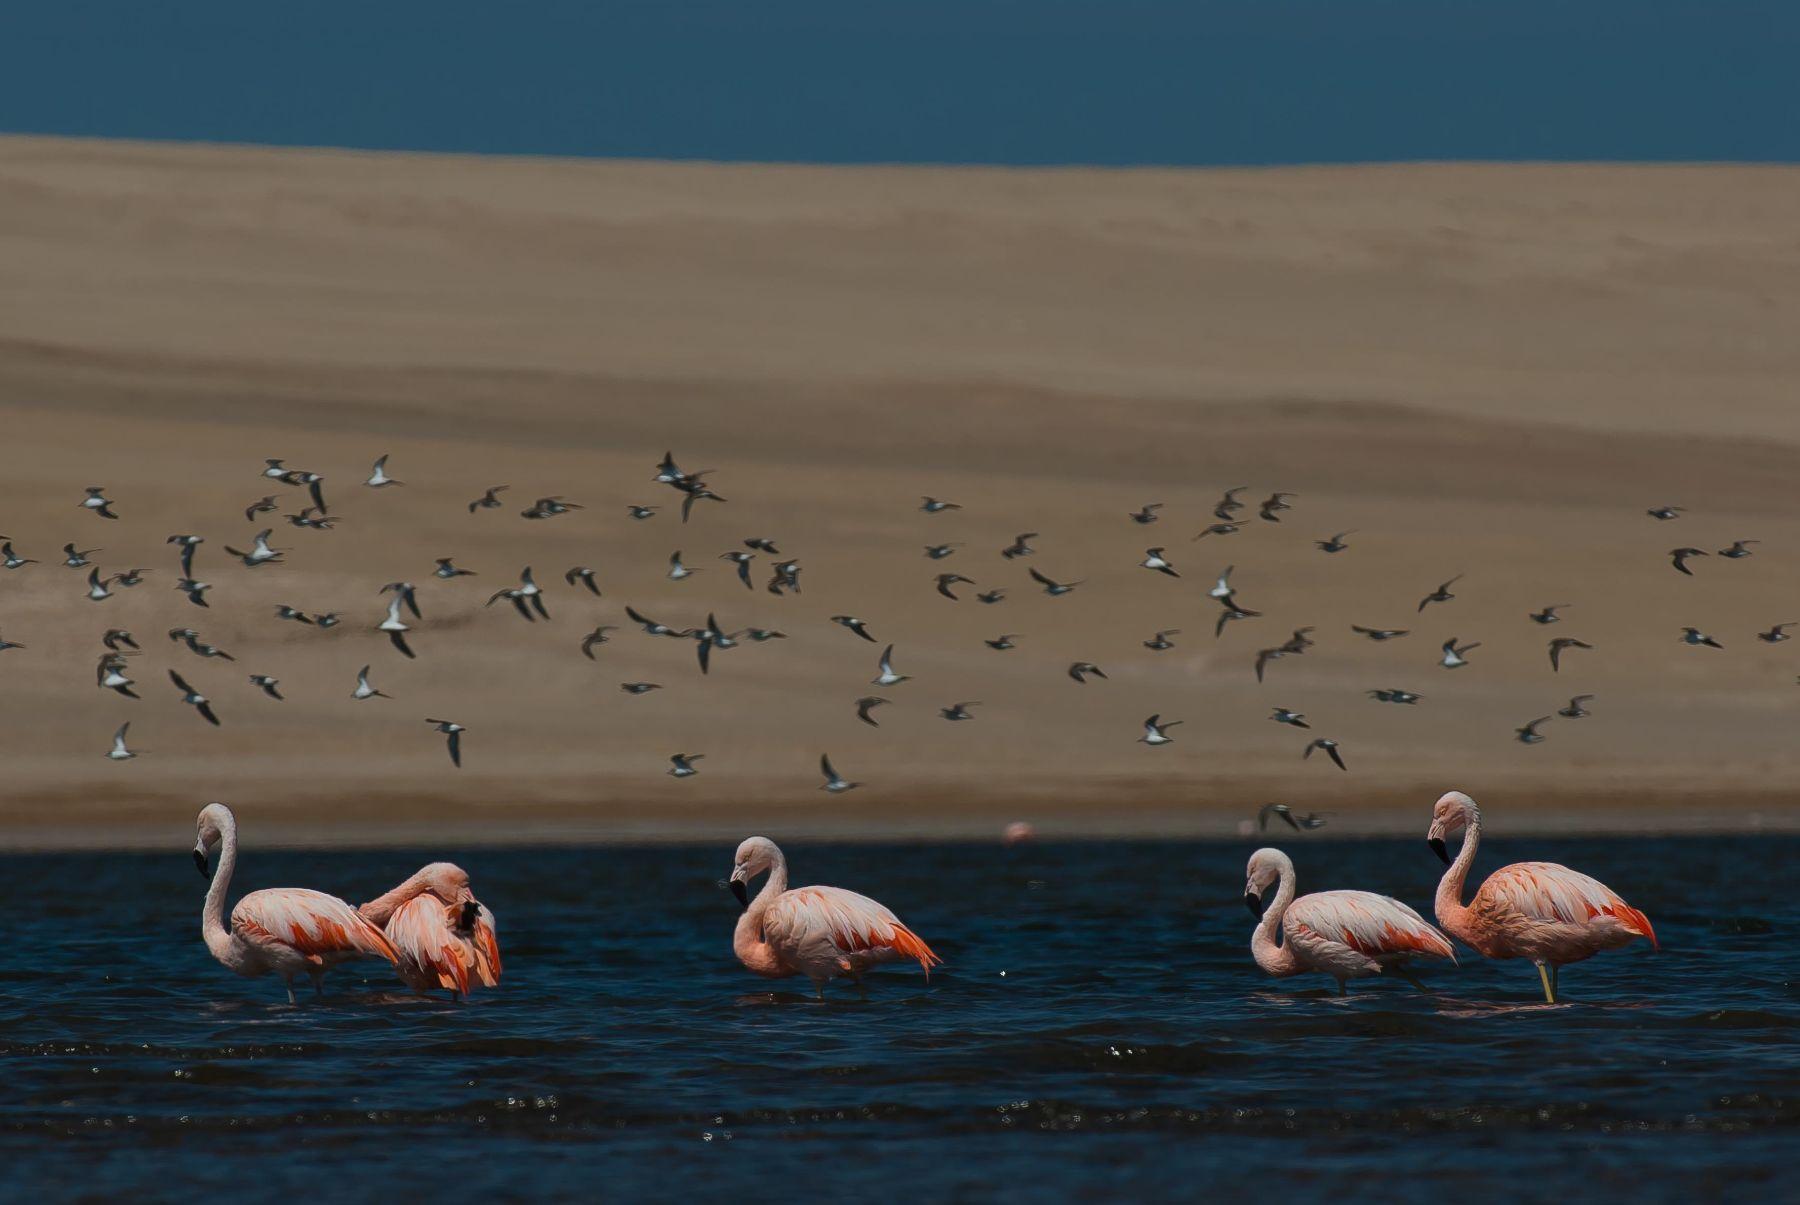 Reserva nacional Paracas, en Pisco (Ica). Foto: Christian Quispe / Sernanp.